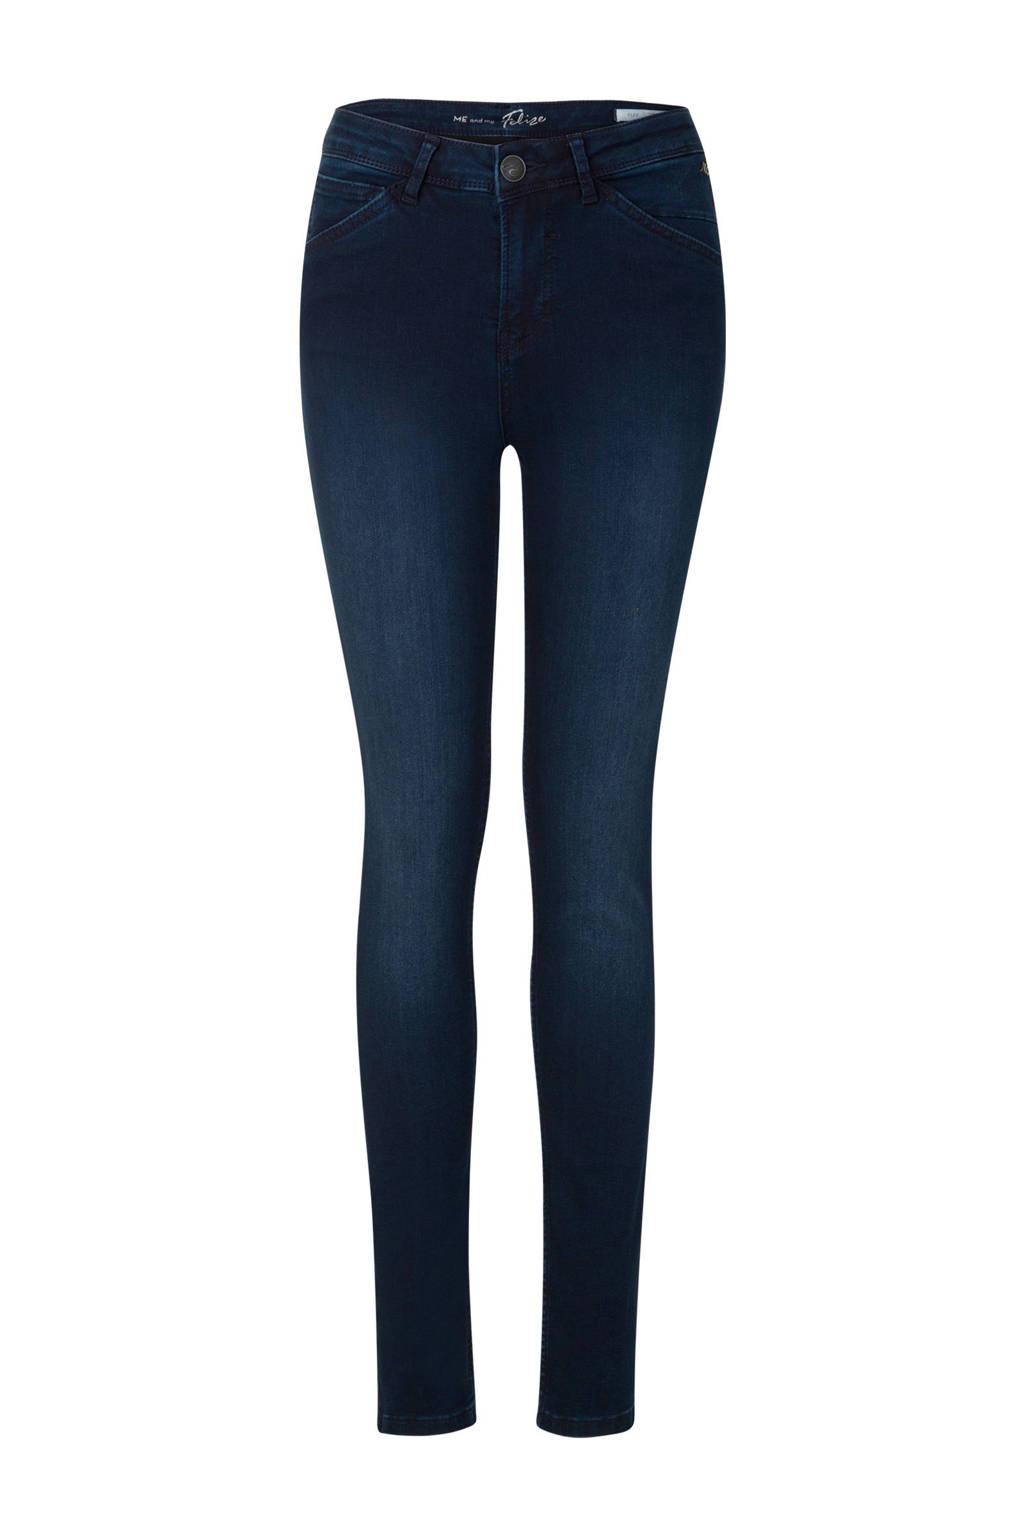 Miss Etam Regulier skinny jeans Felize Flex 32 inch donkerblauw, Donkerblauw